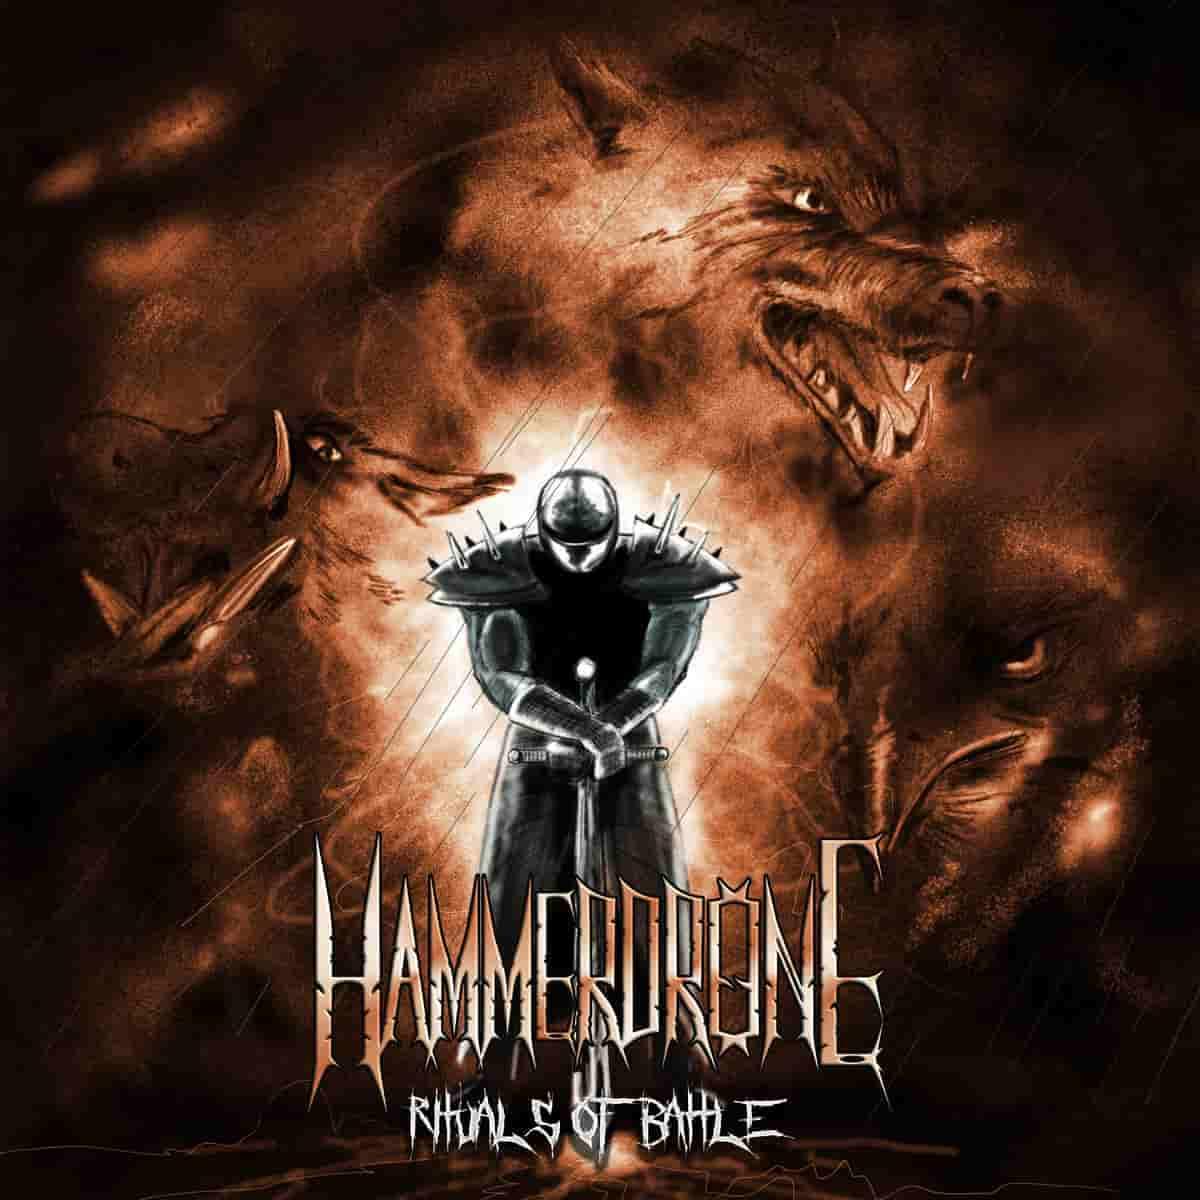 Hammerdrone - Rituals of Battle